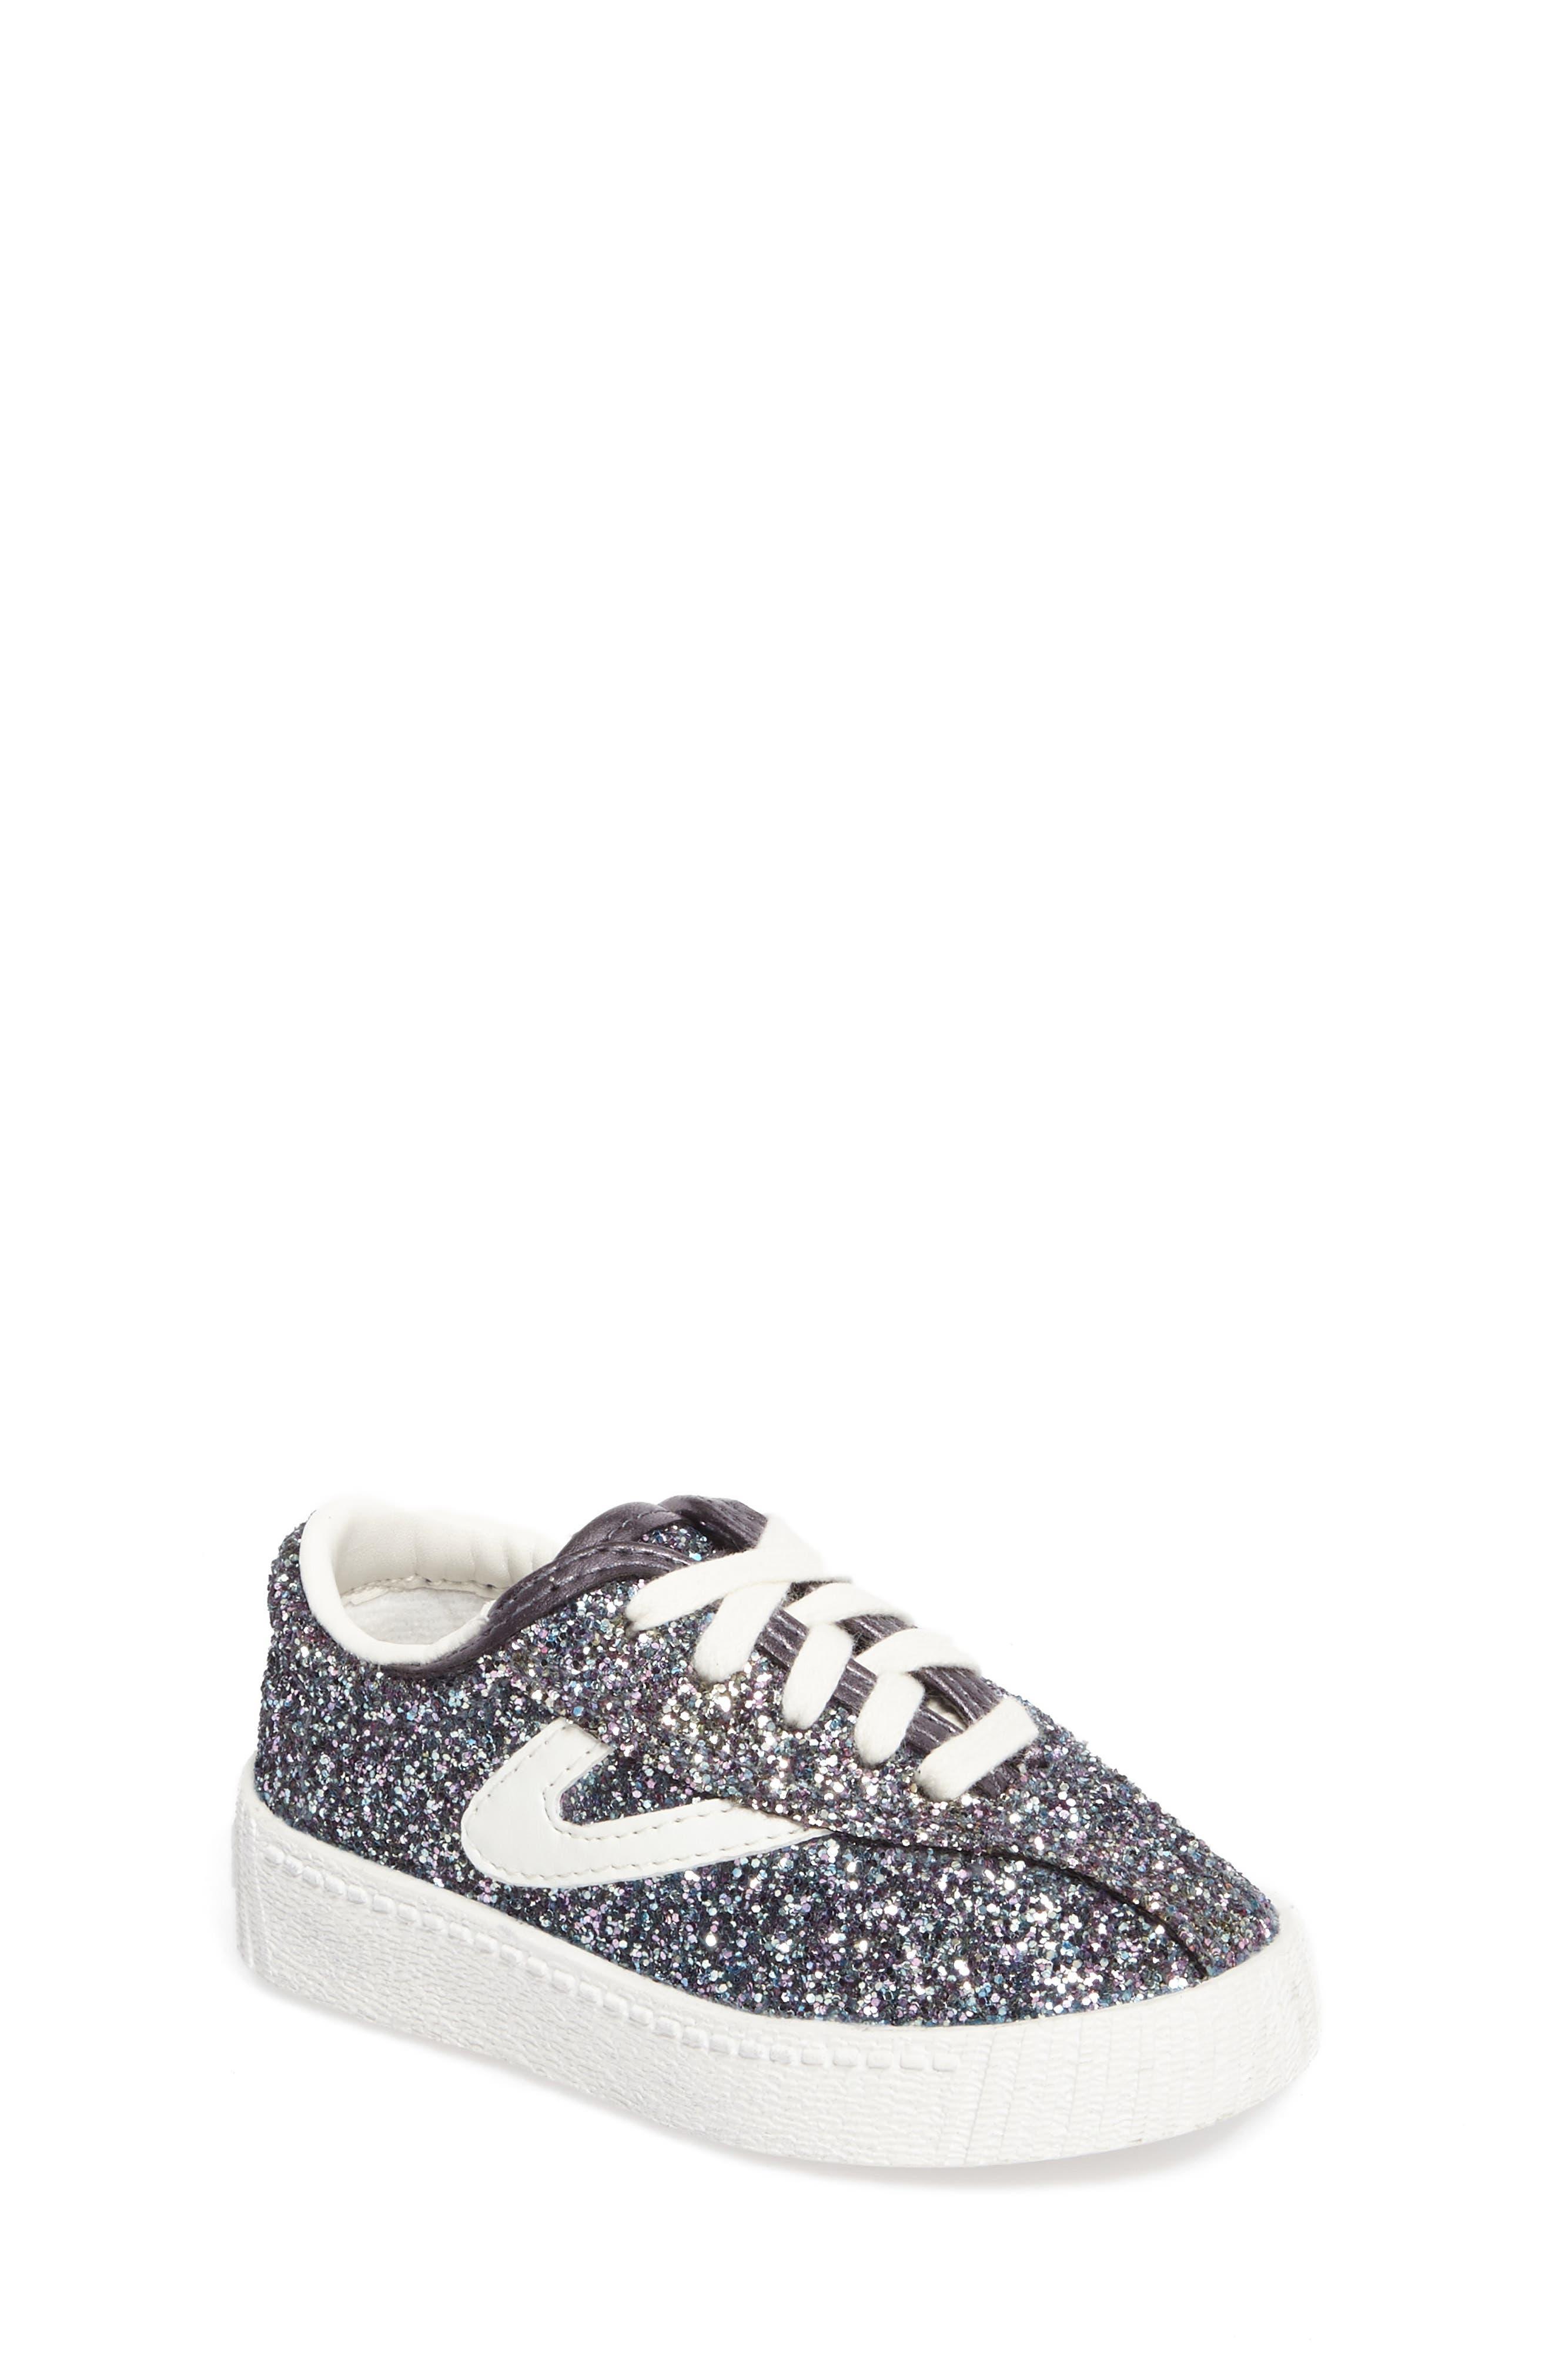 Tretorn Nylite Sugar Glitter Sneaker (Walker, Toddler, Little Kid & Big Kid)